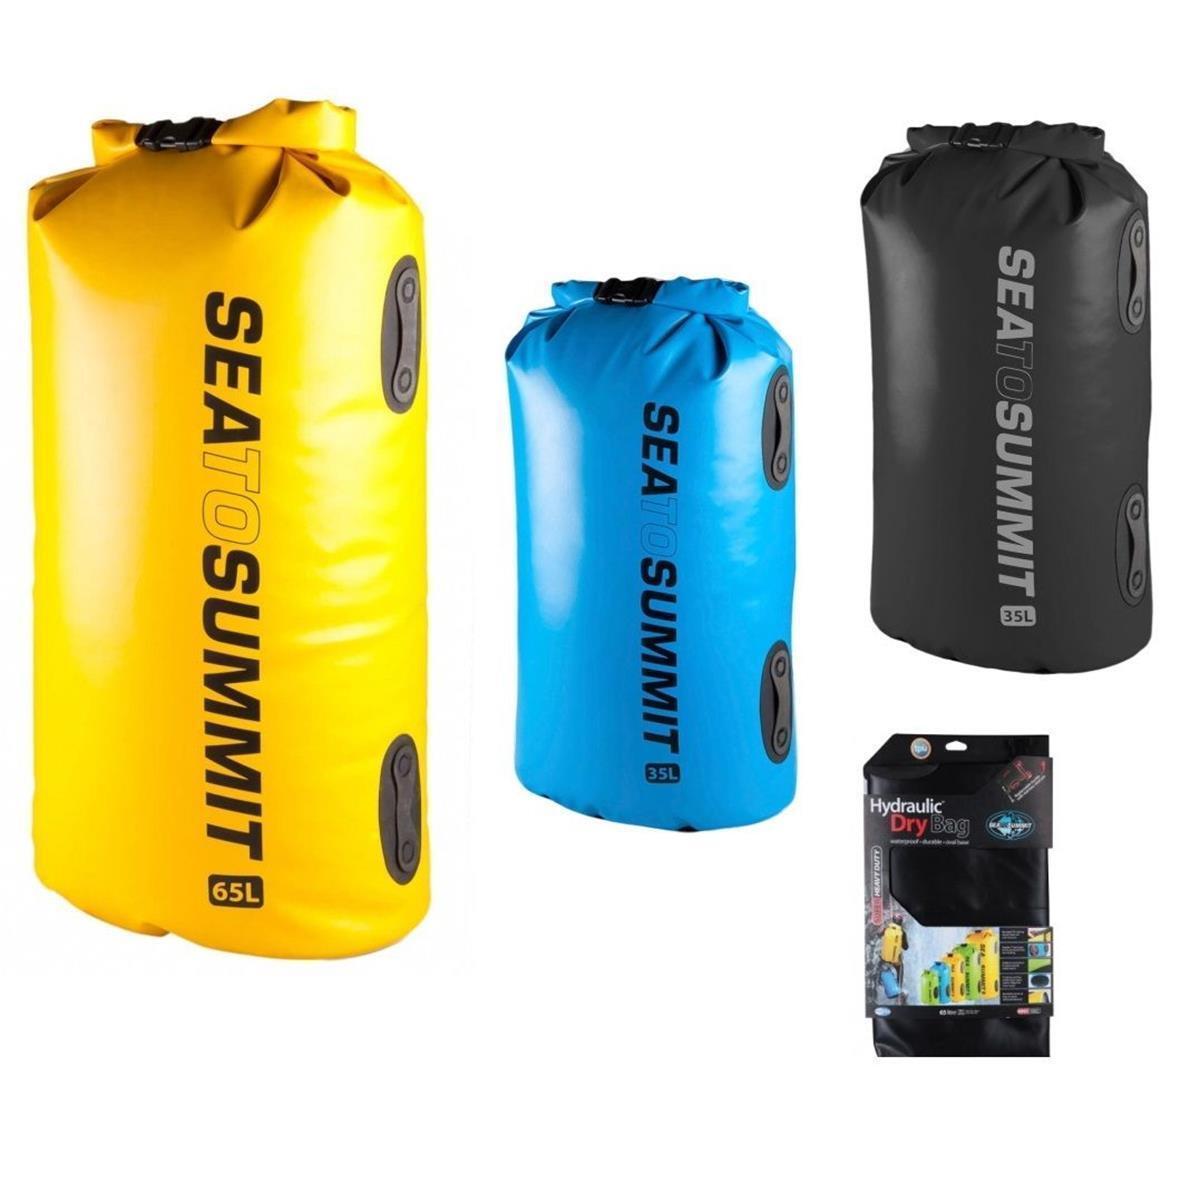 Sea to Summit hydraulic DRY BAG SACCO   65 LITRI-giallo